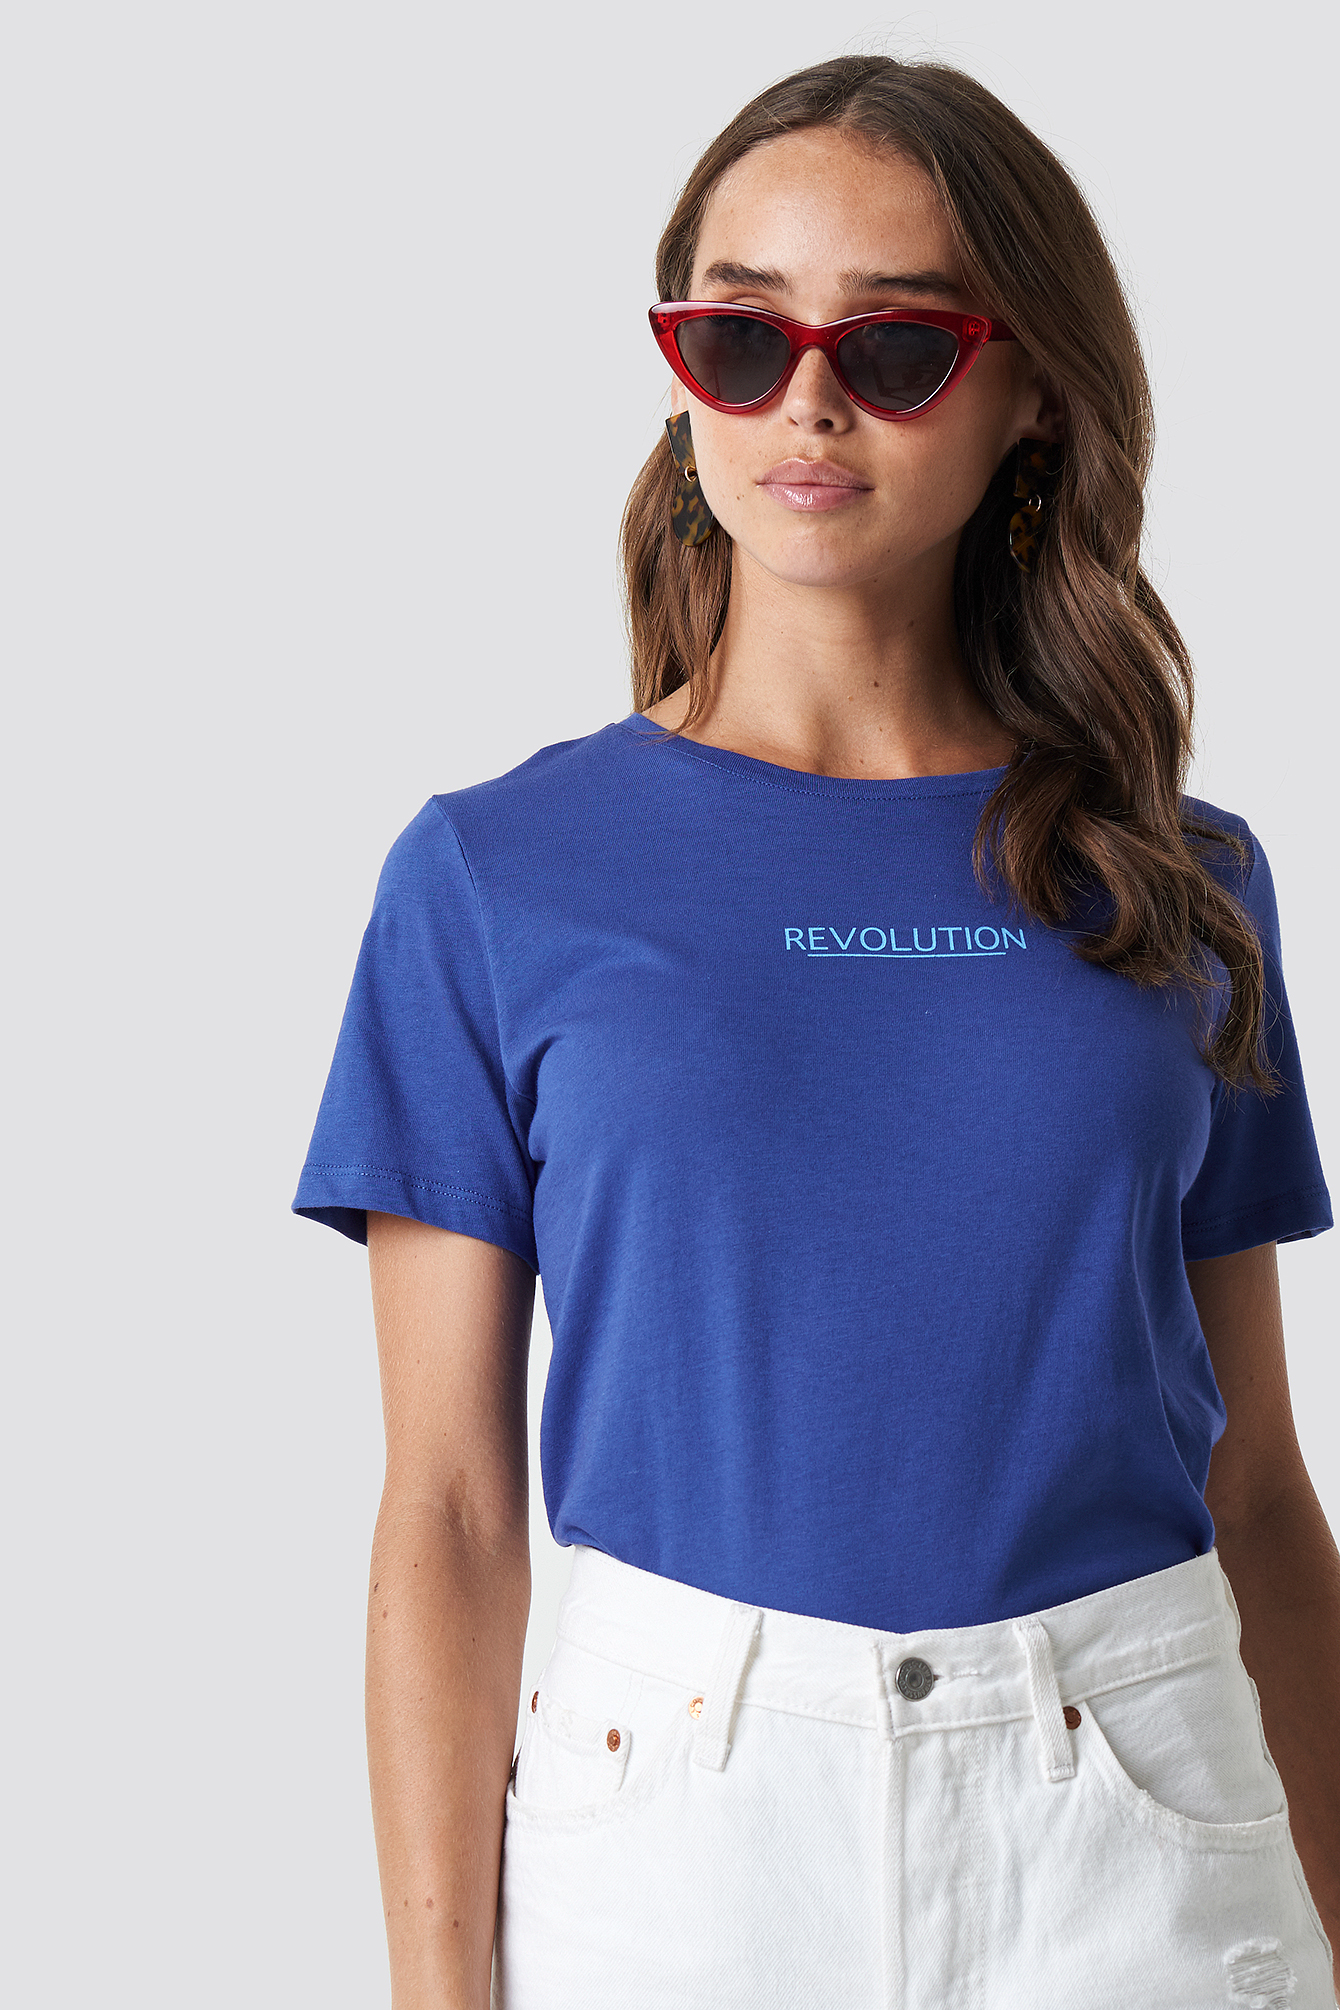 T-shirt Revolution NA-KD.COM